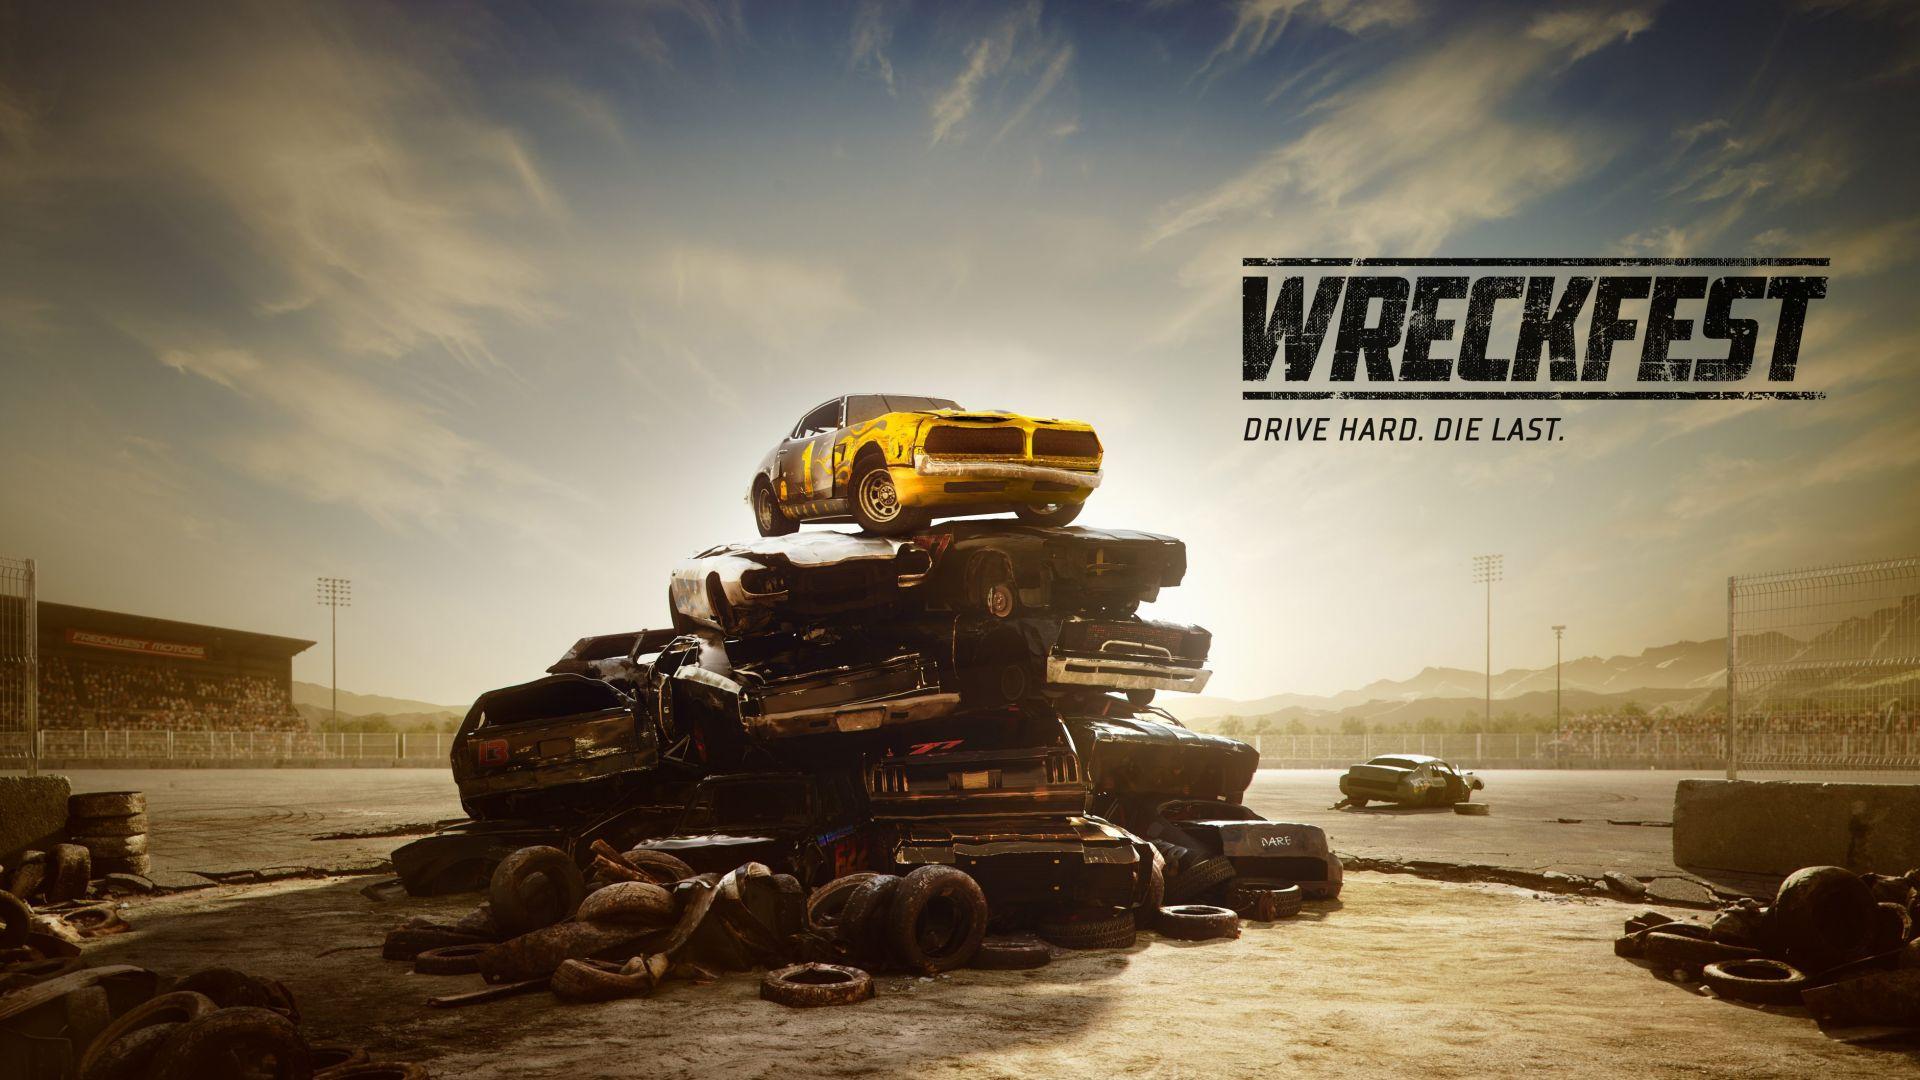 Wallpaper Wreckfest, Next Car Game, E3 2018, poster, 4K, Games 19220